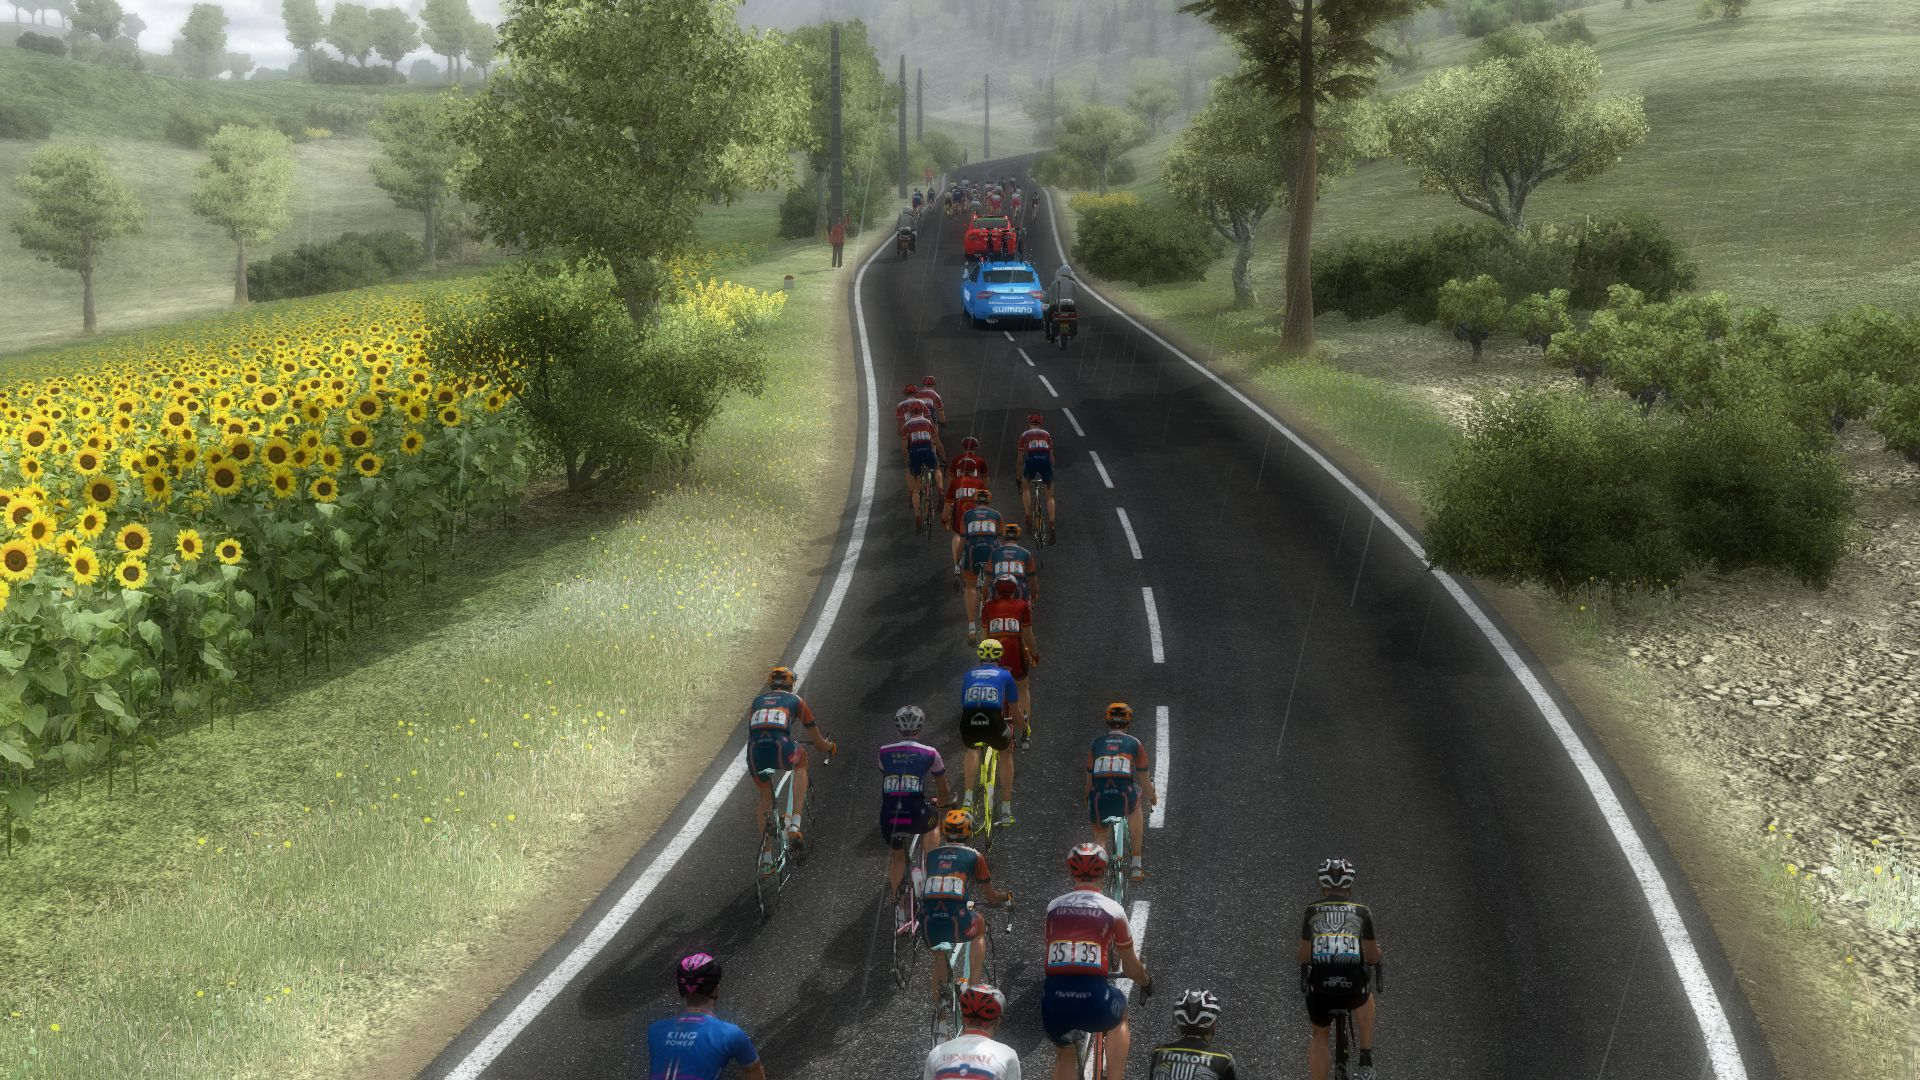 pcmdaily.com/images/mg/2020/Reports/GTM/Giro/S08/mg20_giro_s08_39.jpg